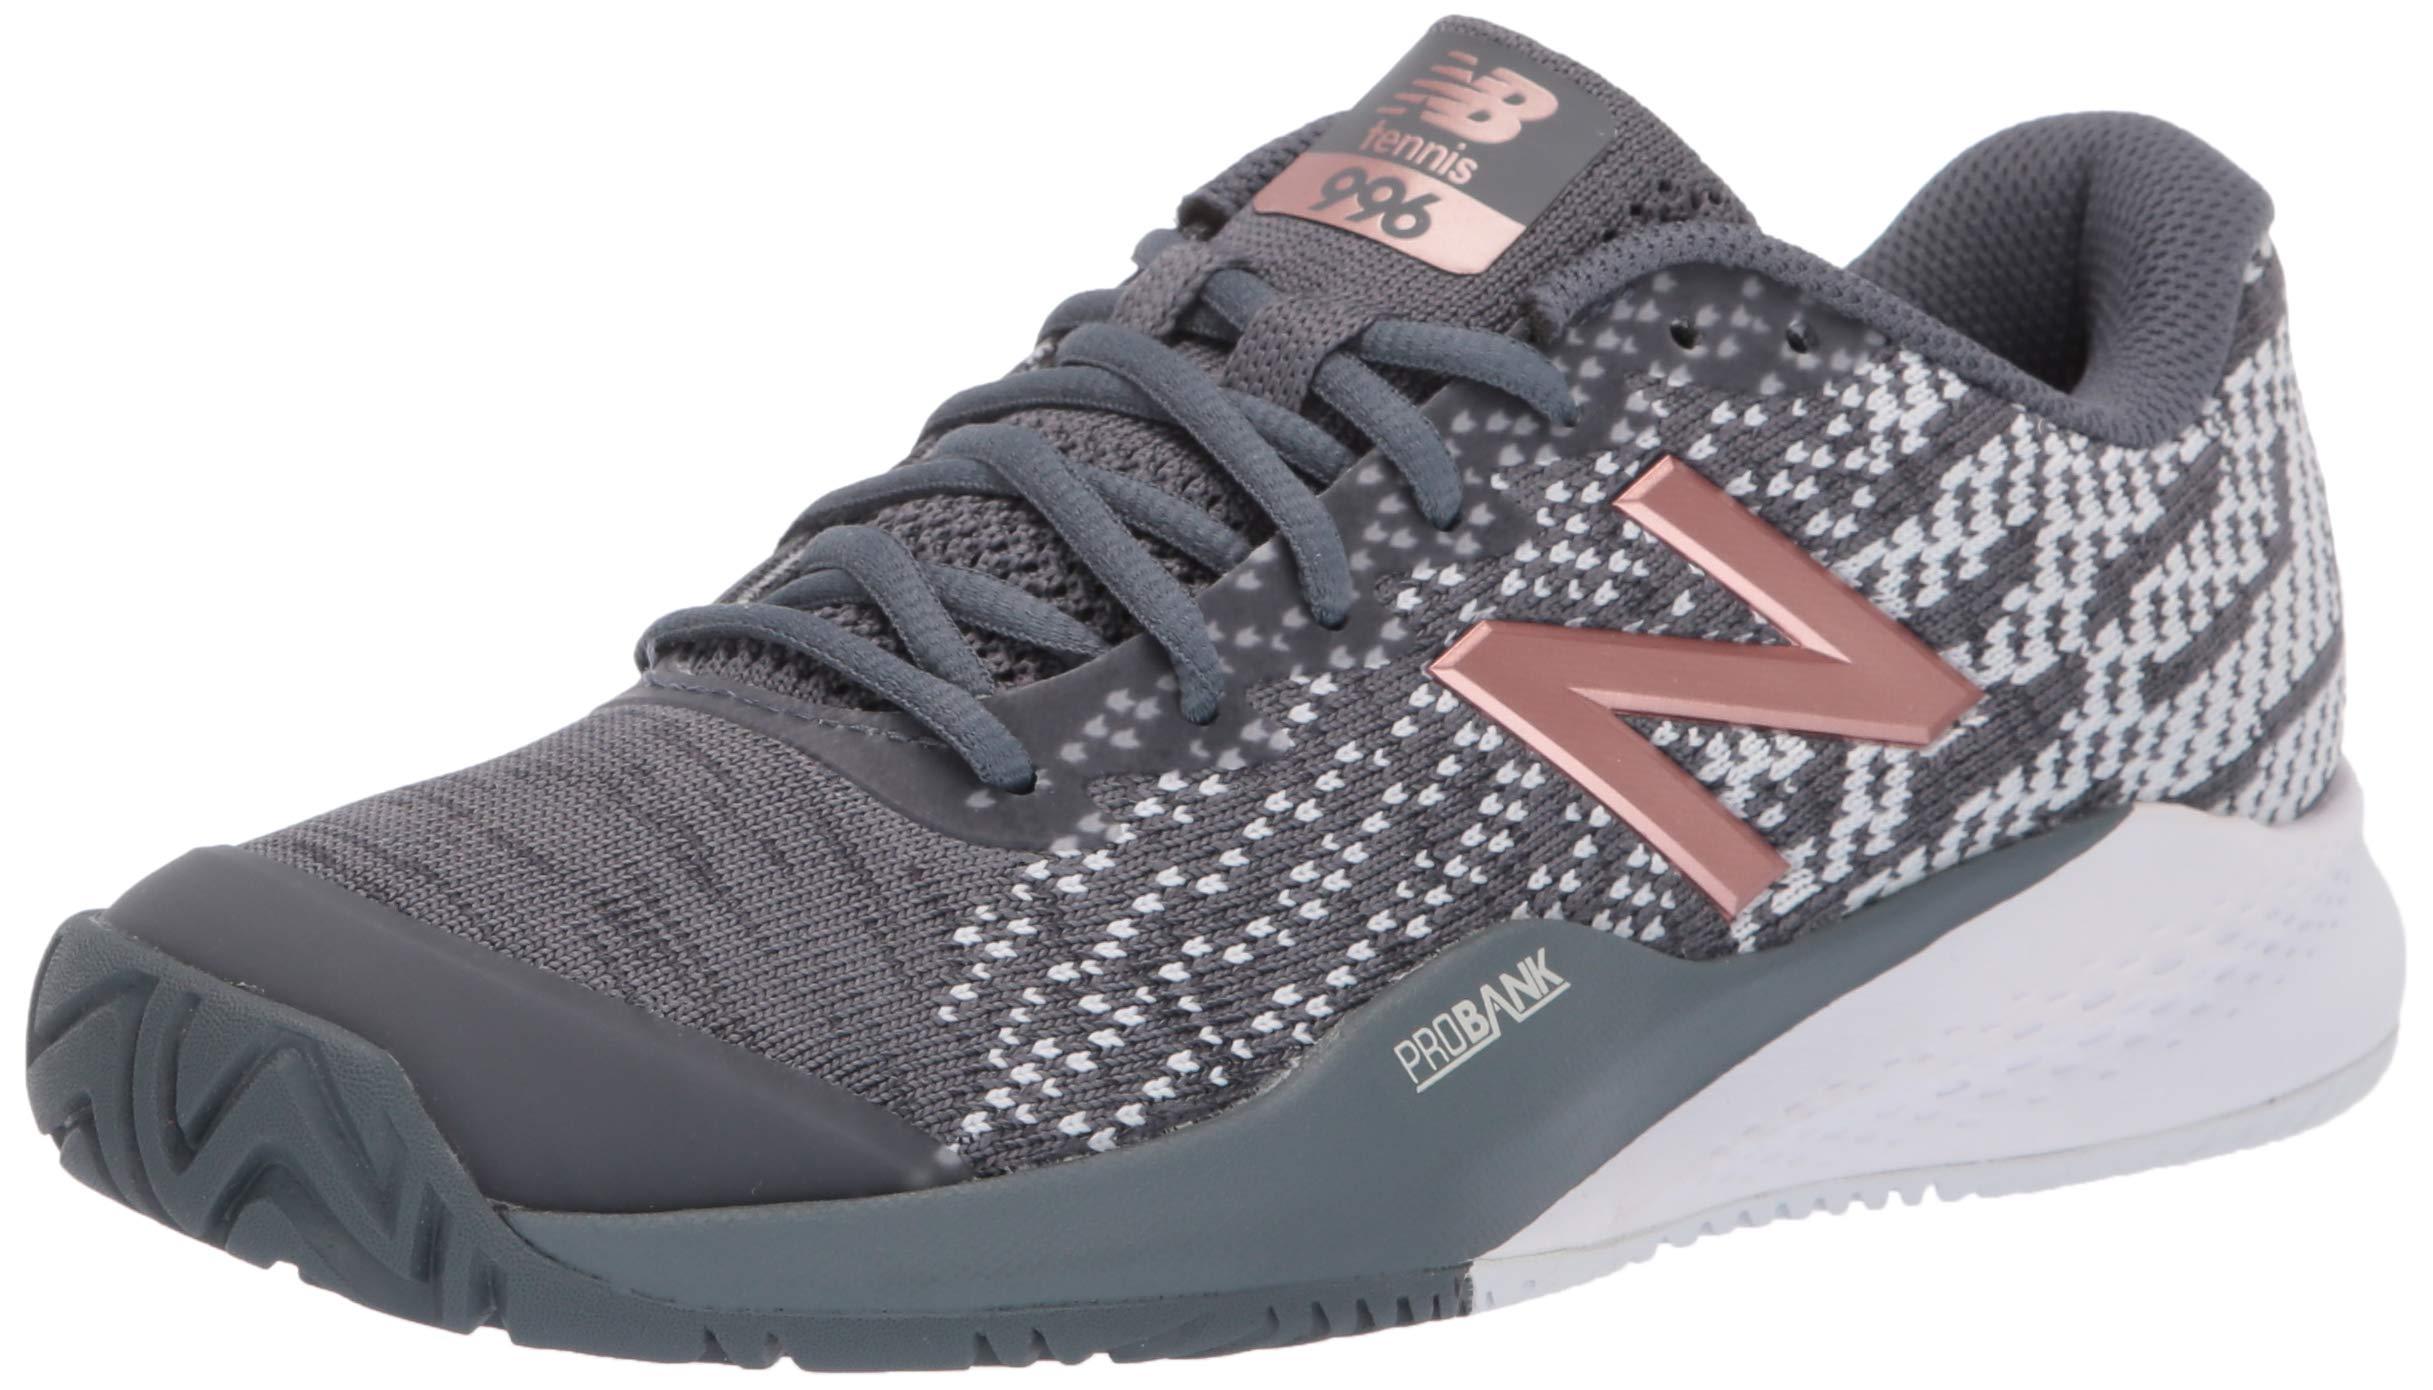 New Balance Women's 996v3 Hard Court Tennis Shoe Black/Champagne 5 D US